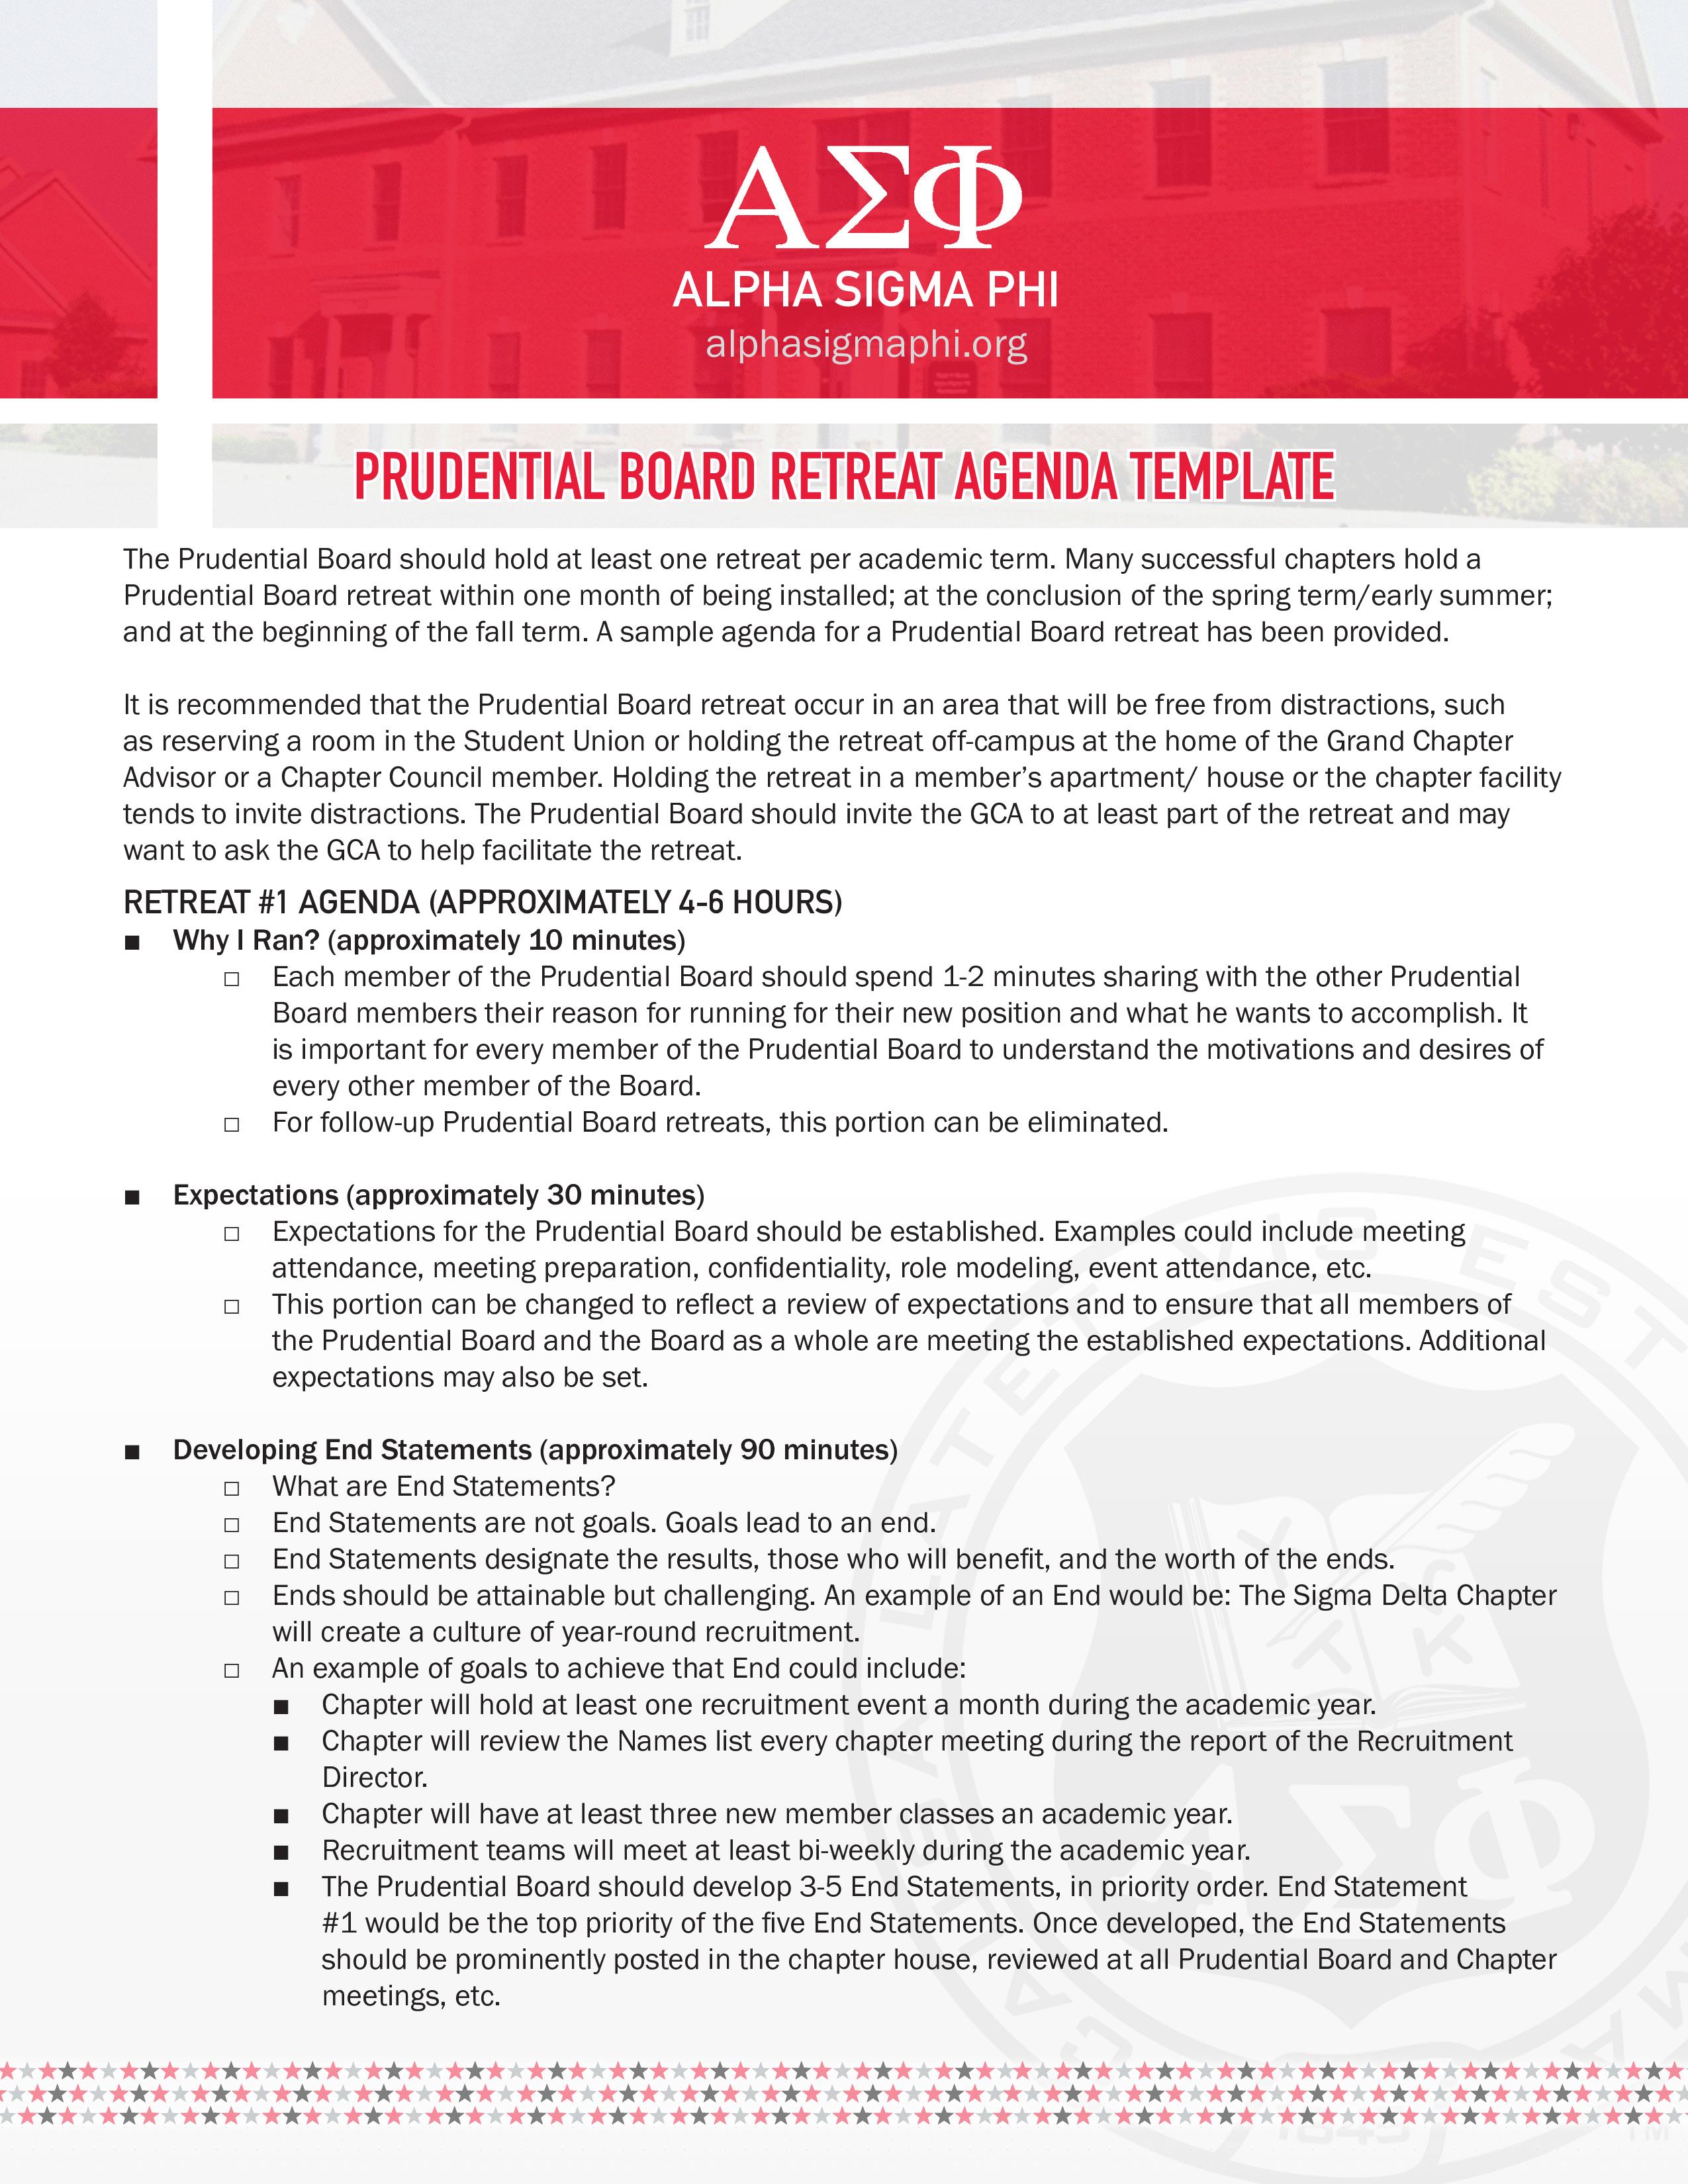 Prudential Board Retreat Agenda How to create a